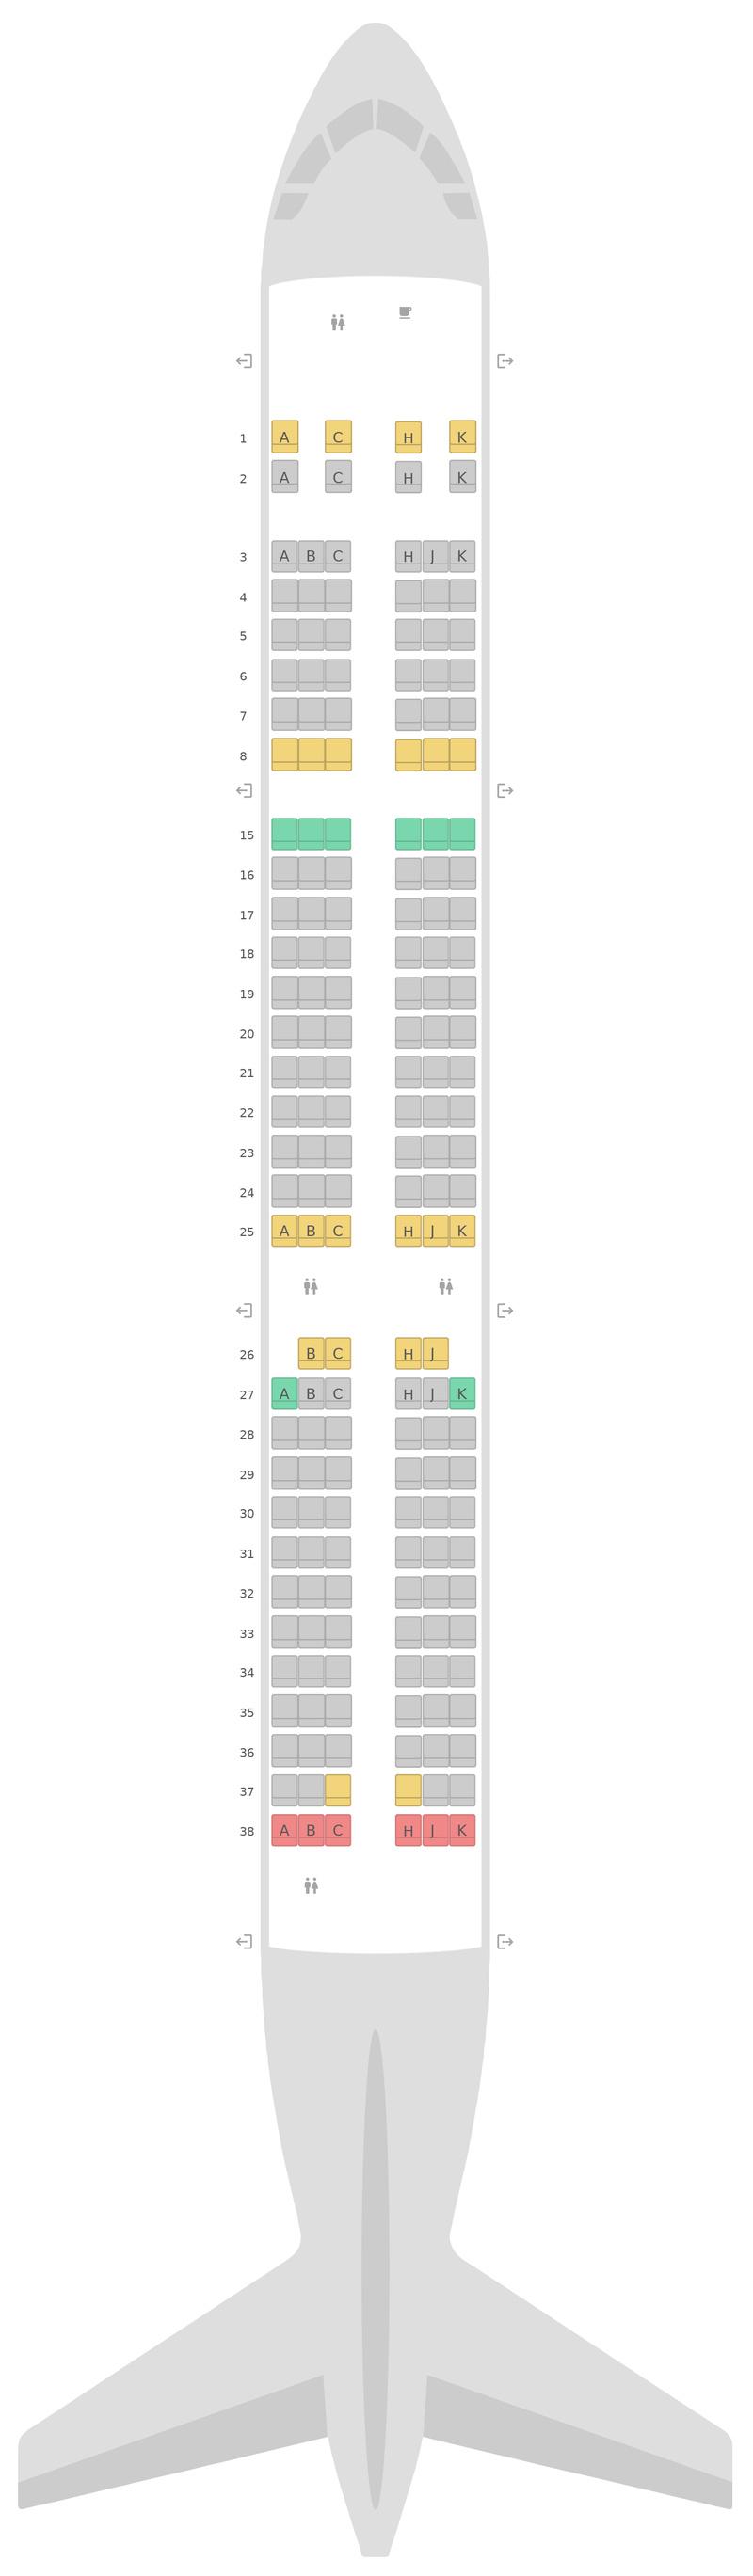 Mapa de asientos Airbus A321 2 Class Air Transat